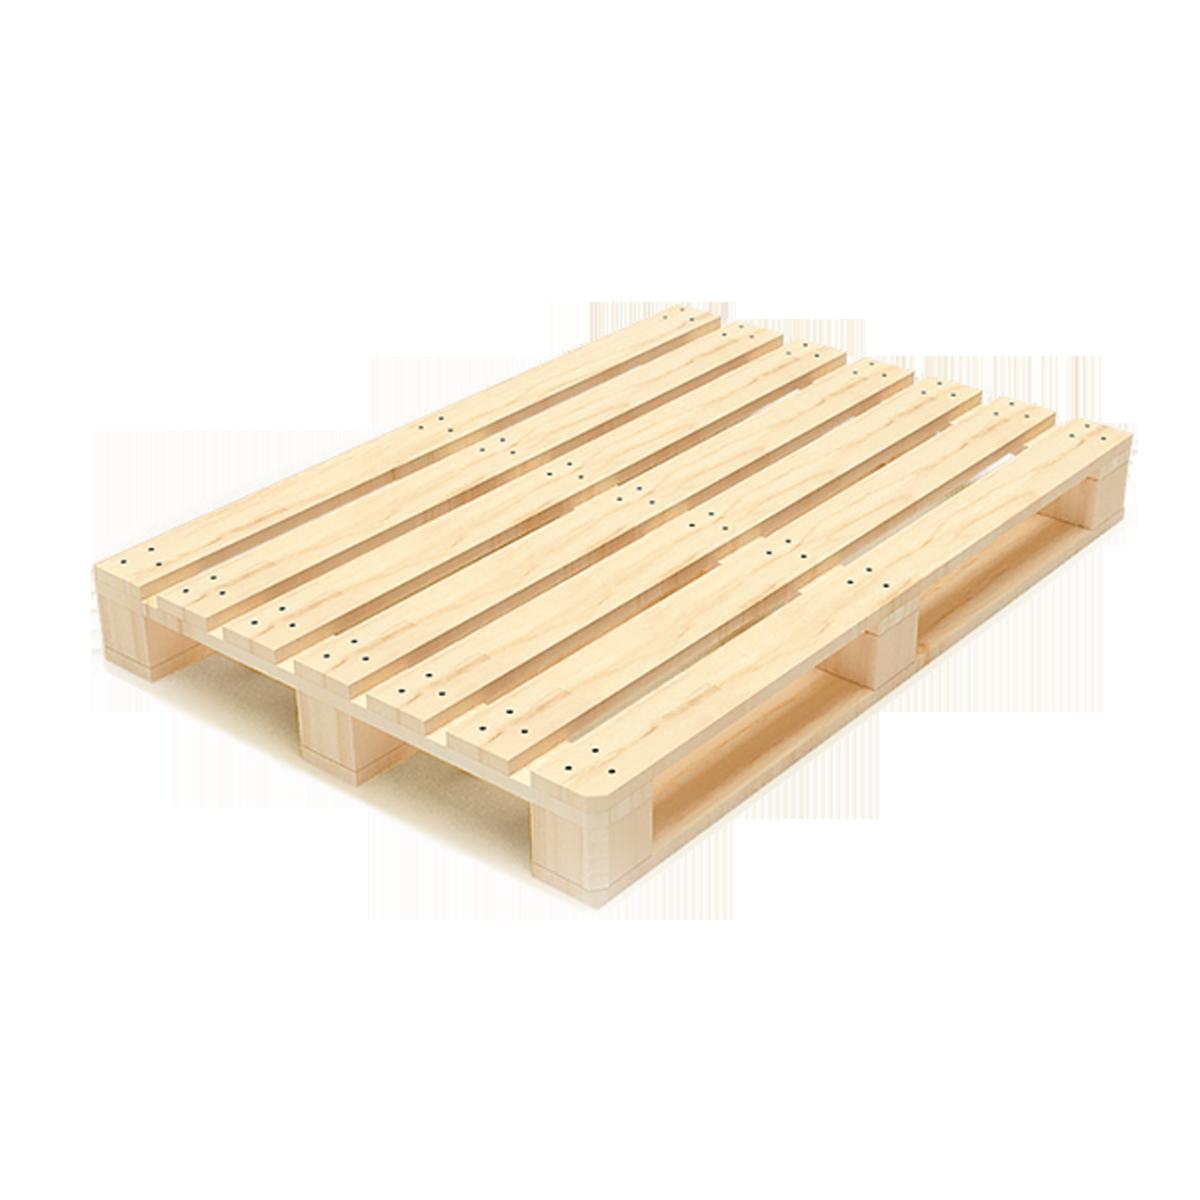 order fulfillment storage pallet